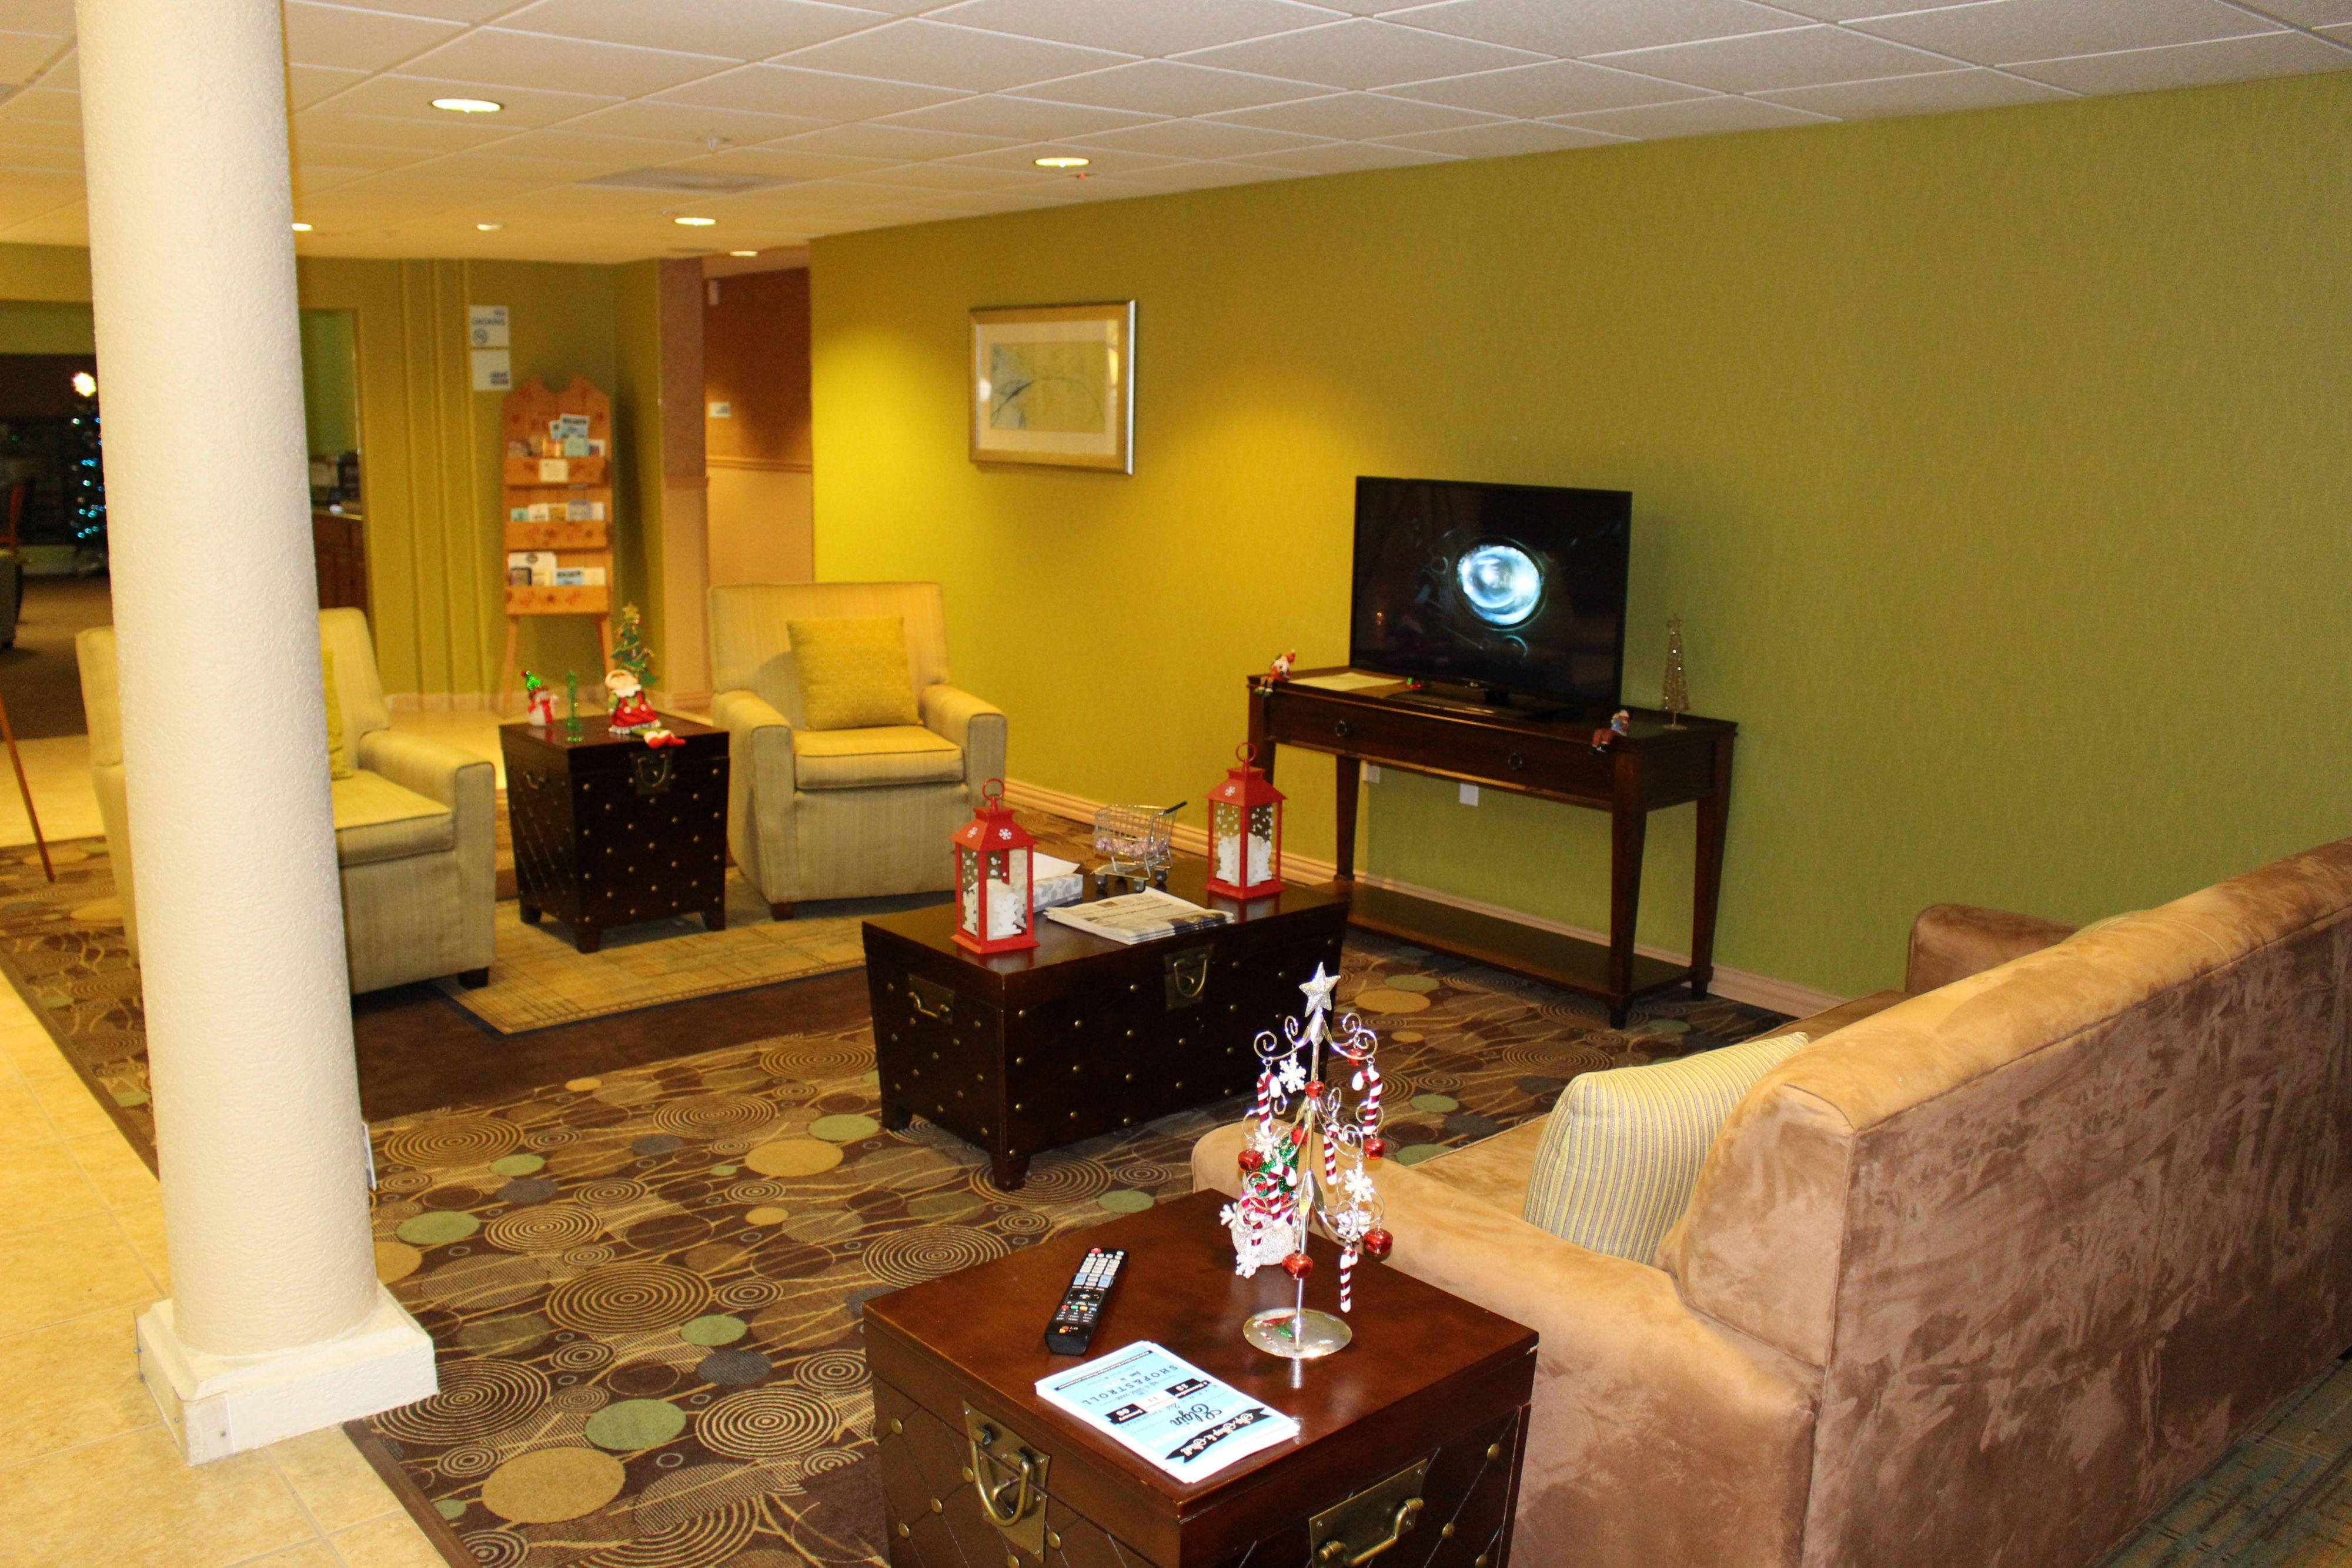 Holiday Inn Express & Suites Elgin image 6